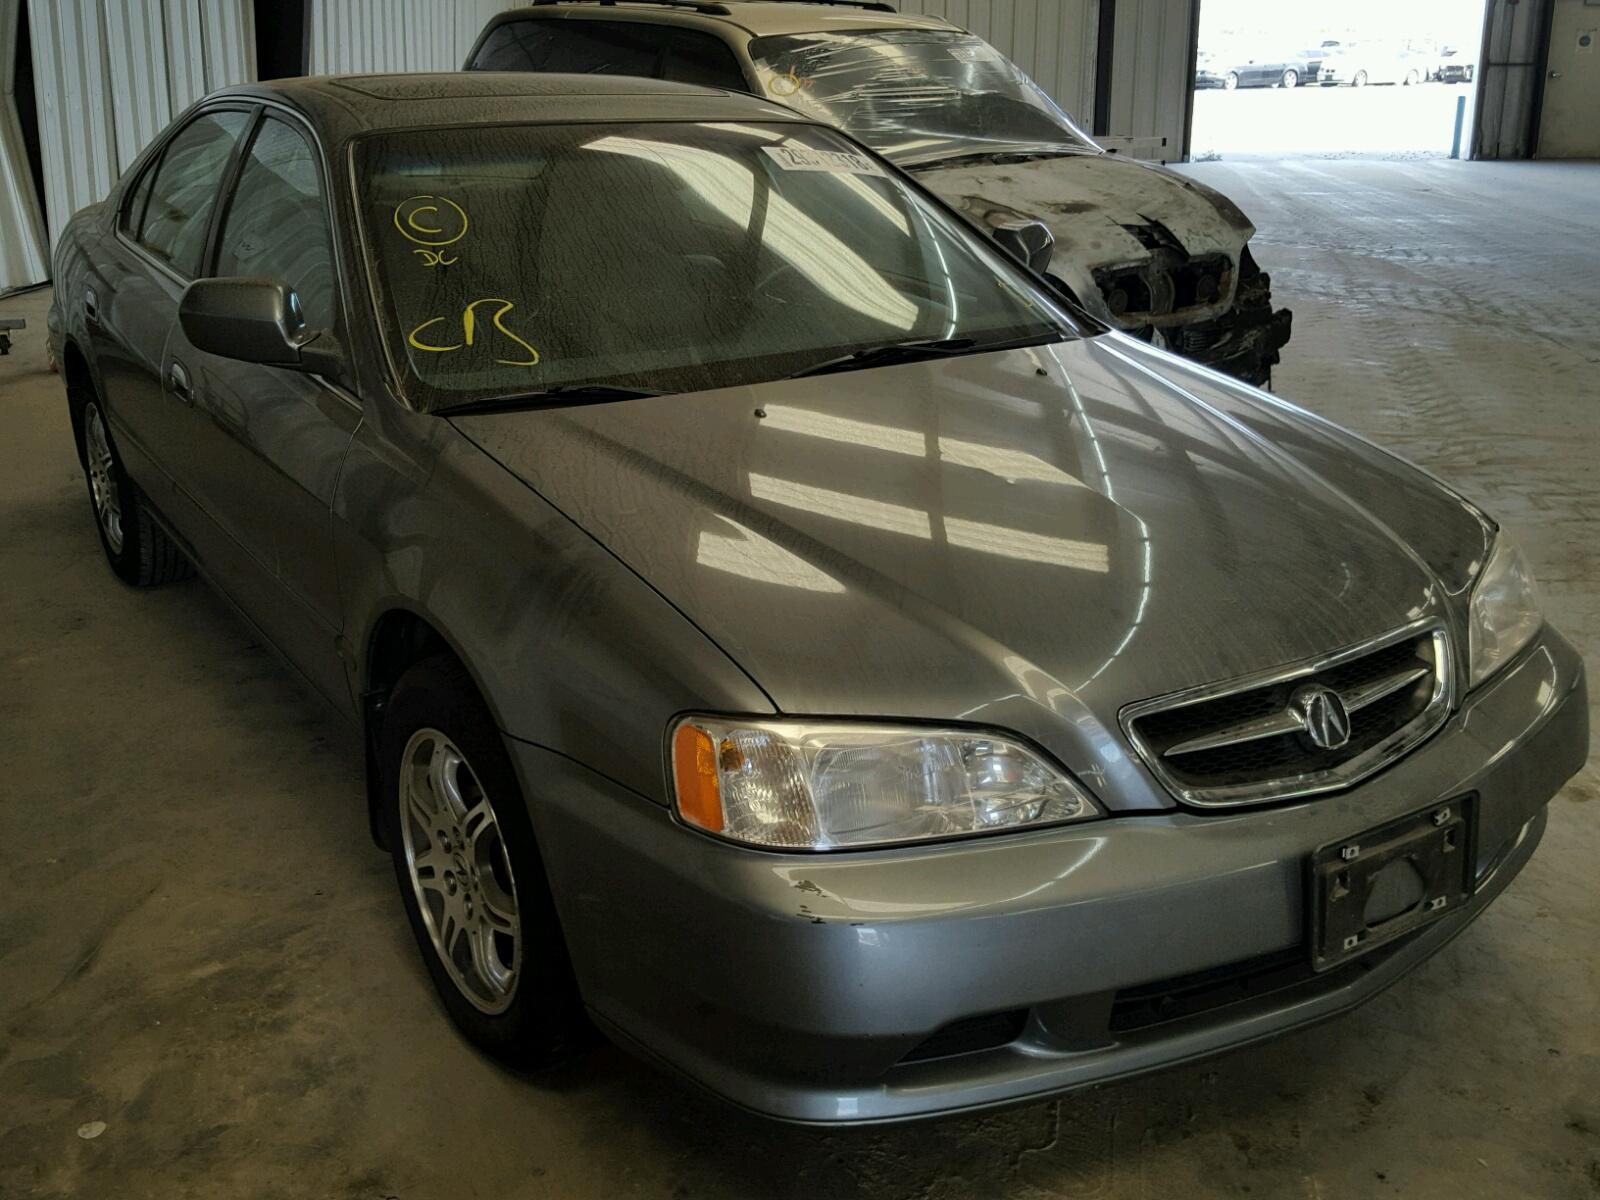 modification ride tl acura sedan original specs photos sale for